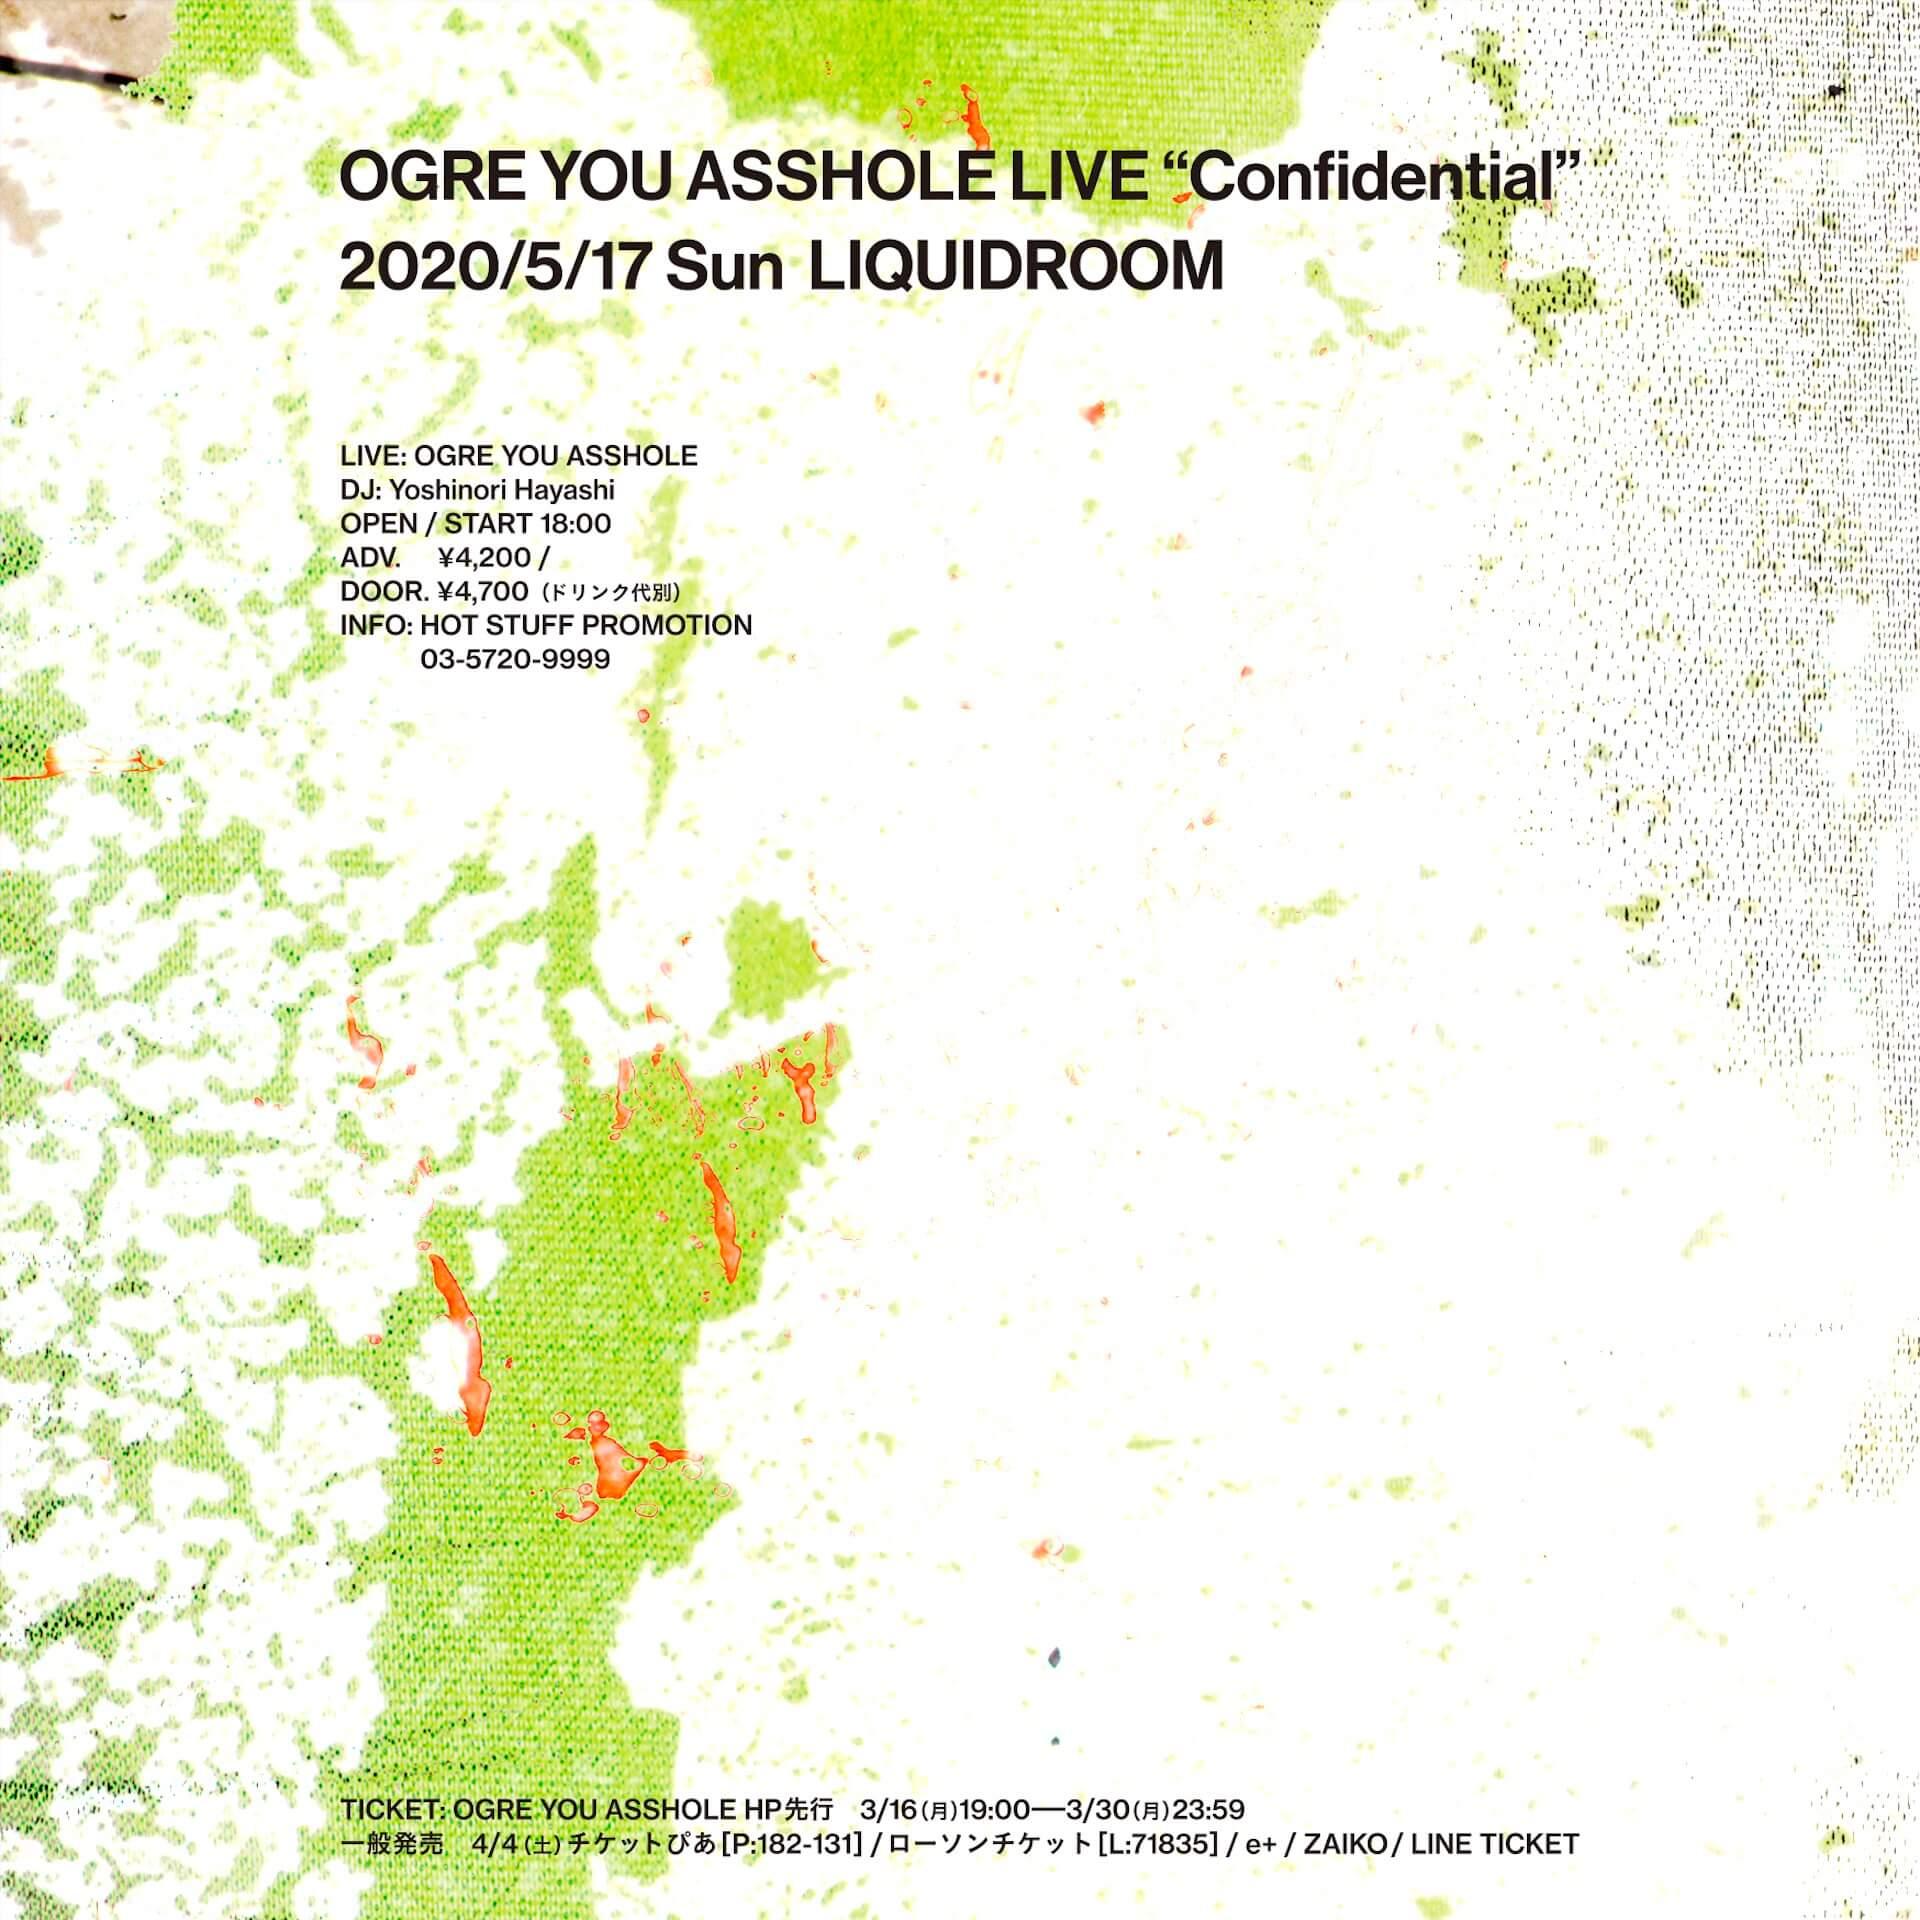 OGRE YOU ASSHOLEがホームのLIQUIDROOMにて、<Confidential>を開催決定|DJ・Yoshinori Hayashiが登場 music200317_ogreyouasshole_01-1